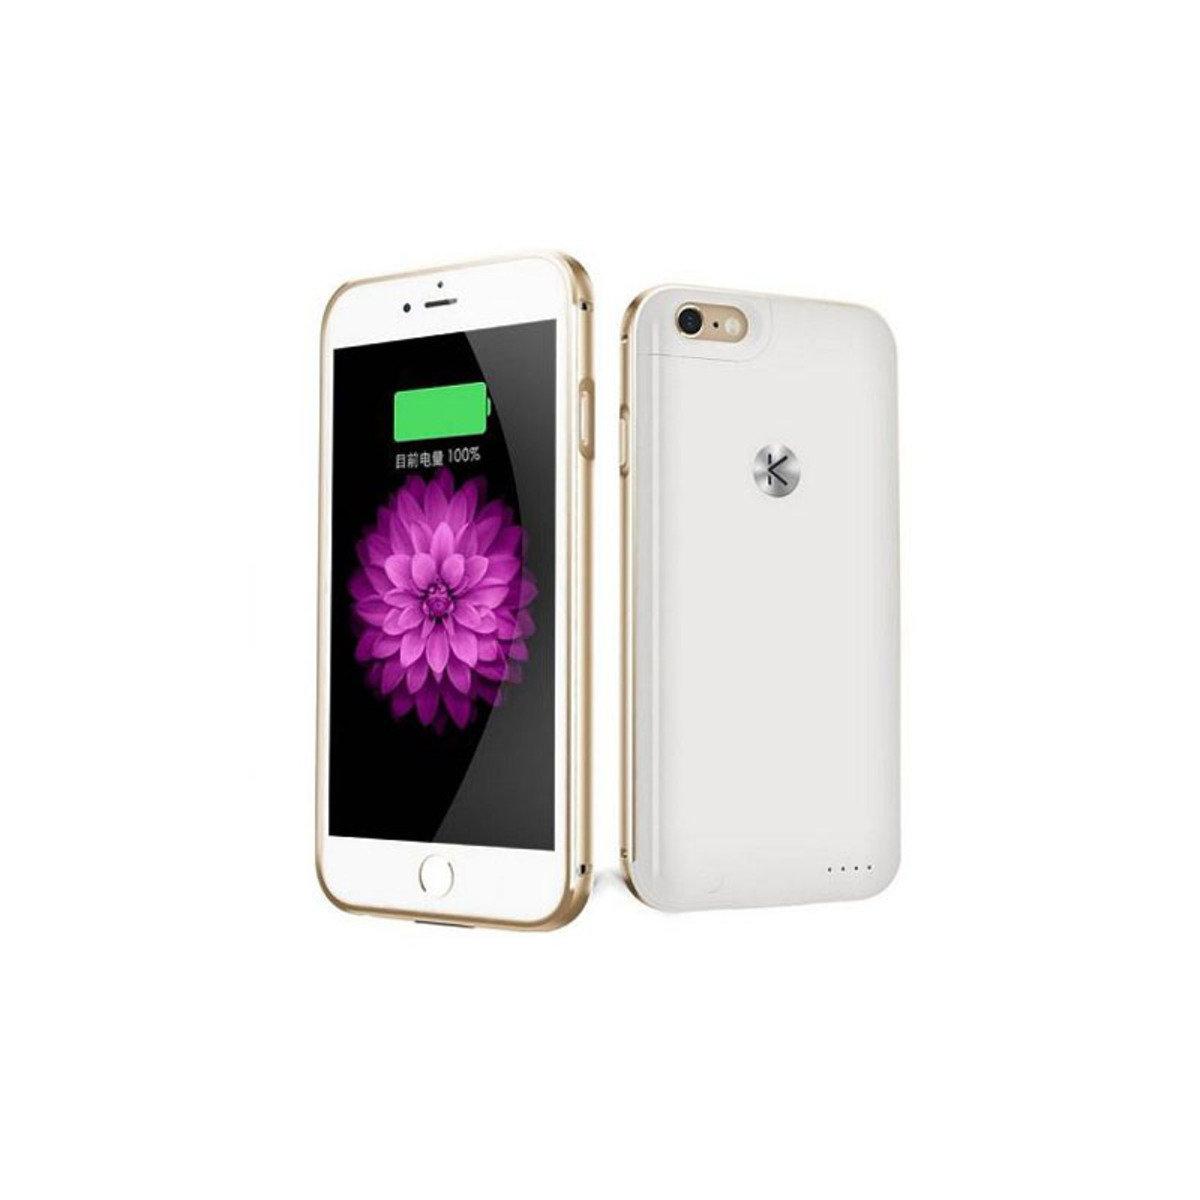 iPhone 6 / 6S 專用金屬邊框機殼連2400mAh充電池 金色+白色